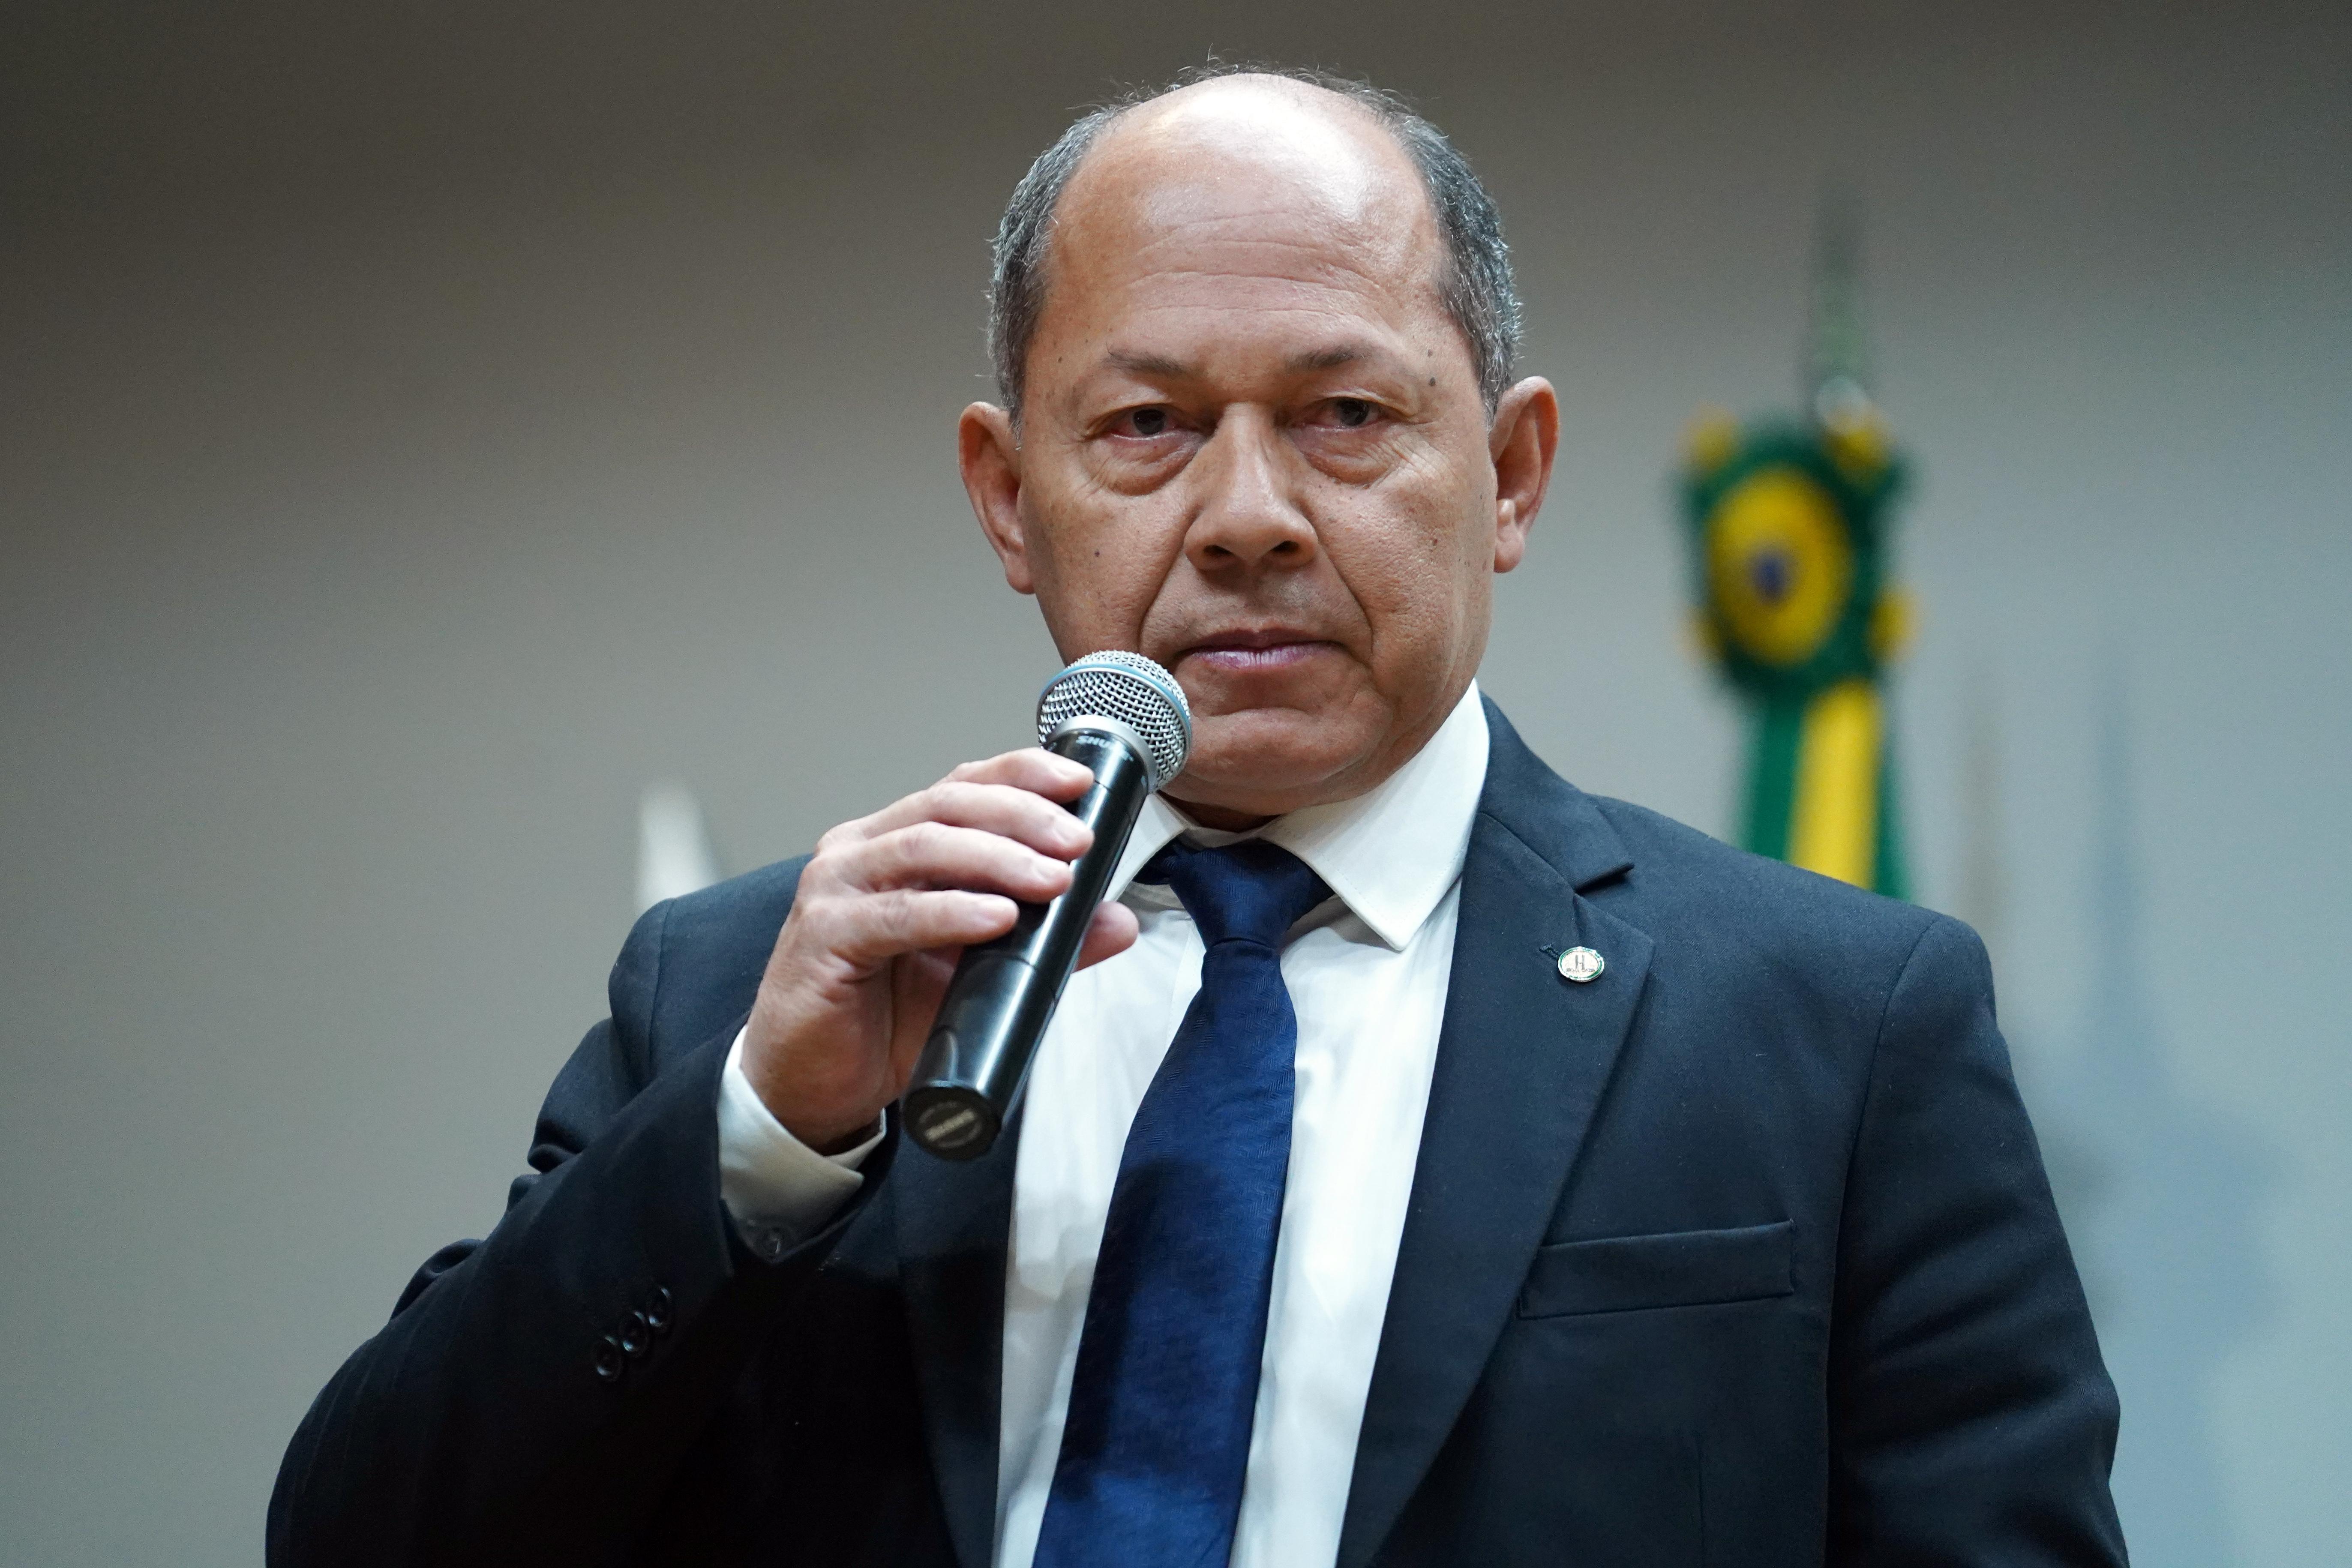 1º Simpósio Brasileiro de Escolas Cívico-Militares. Dep. Coronel Chrisóstomo (PSL - RO)